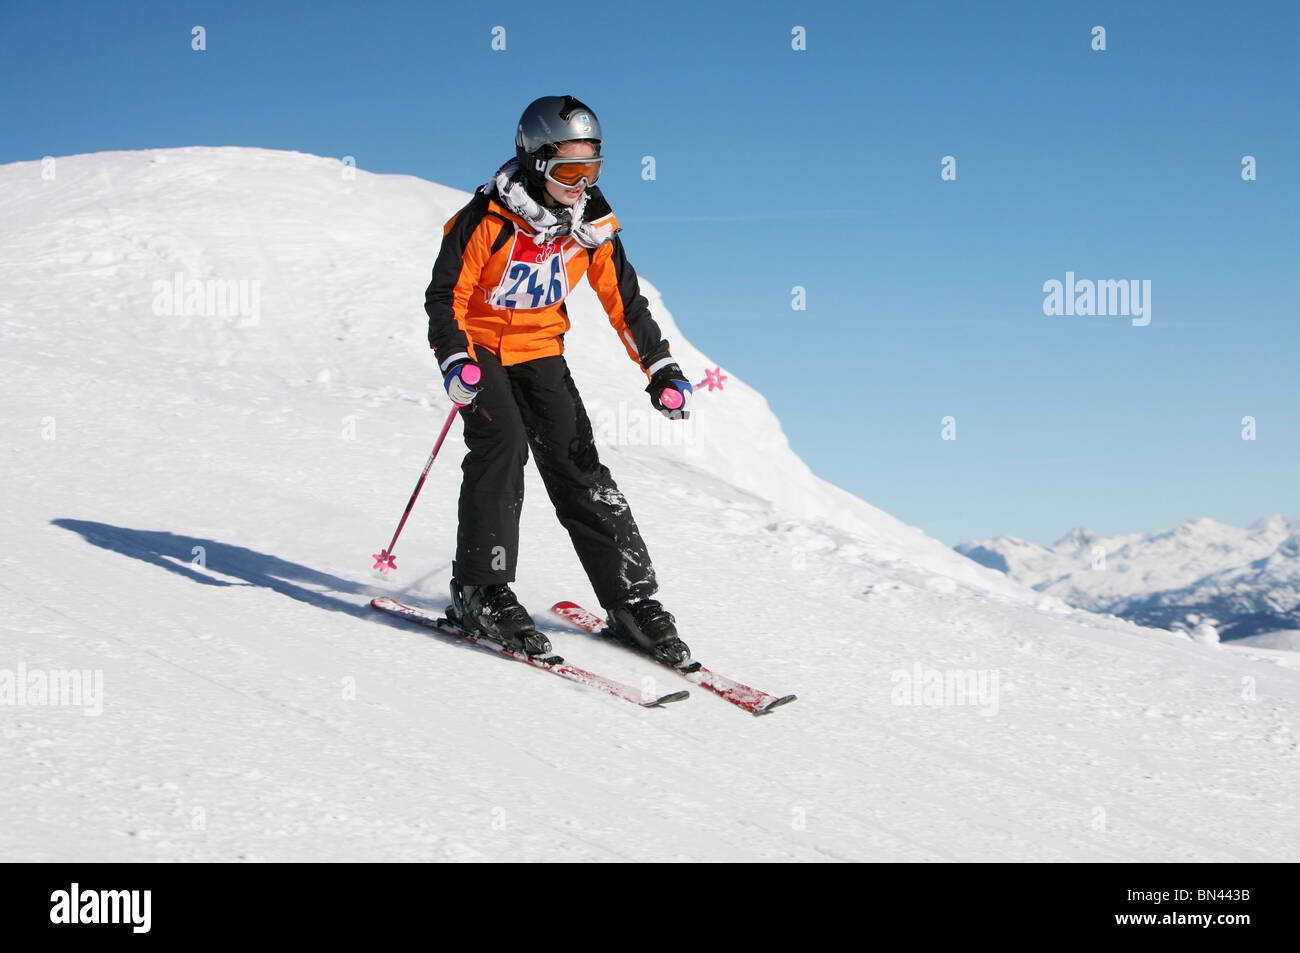 Kid skiing down a slope, Krippenbrunn, Austria - Stock Image